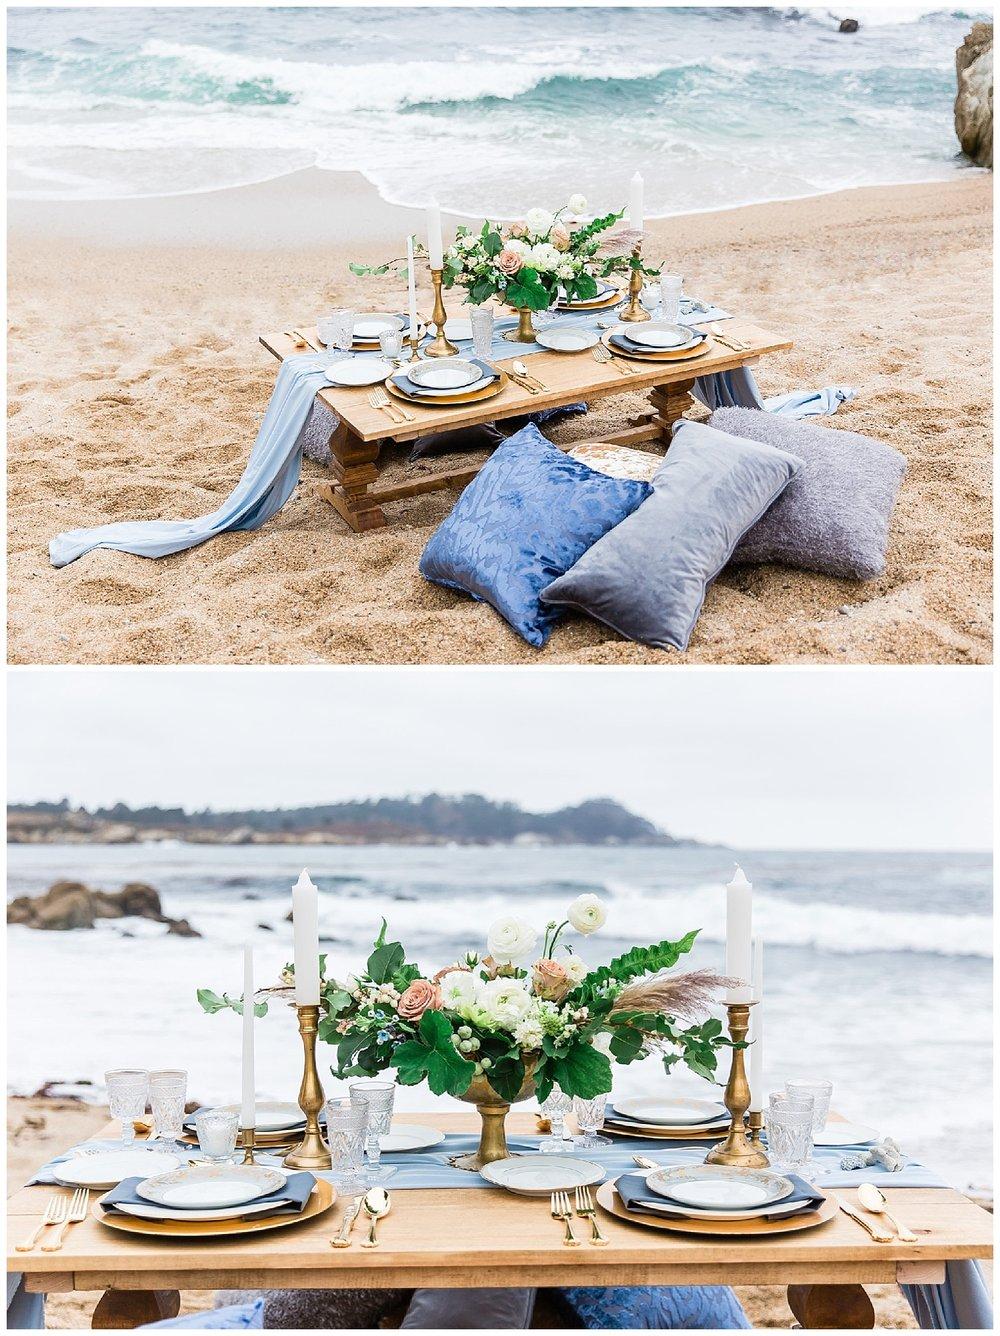 elopement-tables-at-beach-carmel-california.jpg